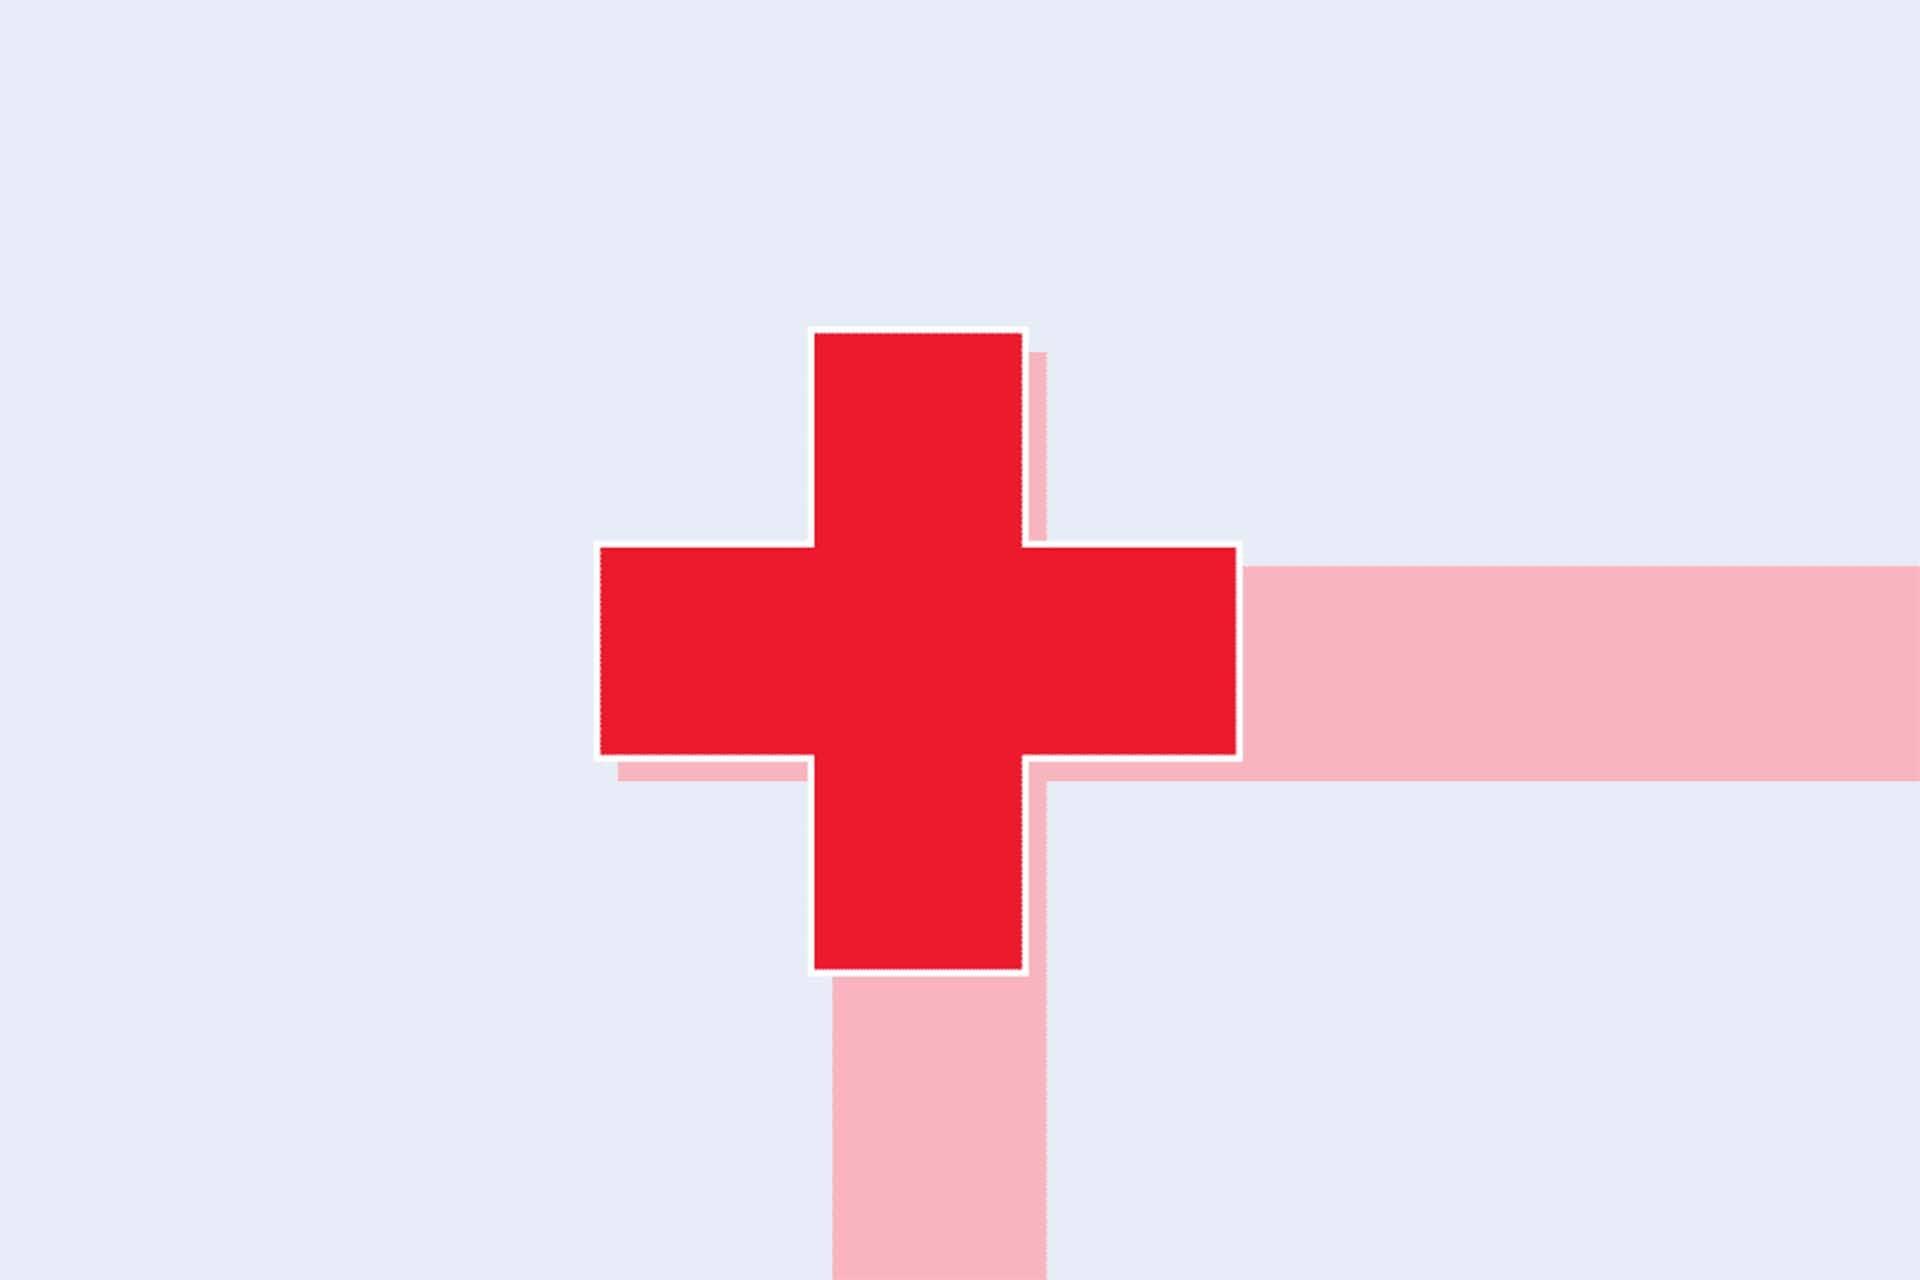 t2informatik Blog: Design Emergency